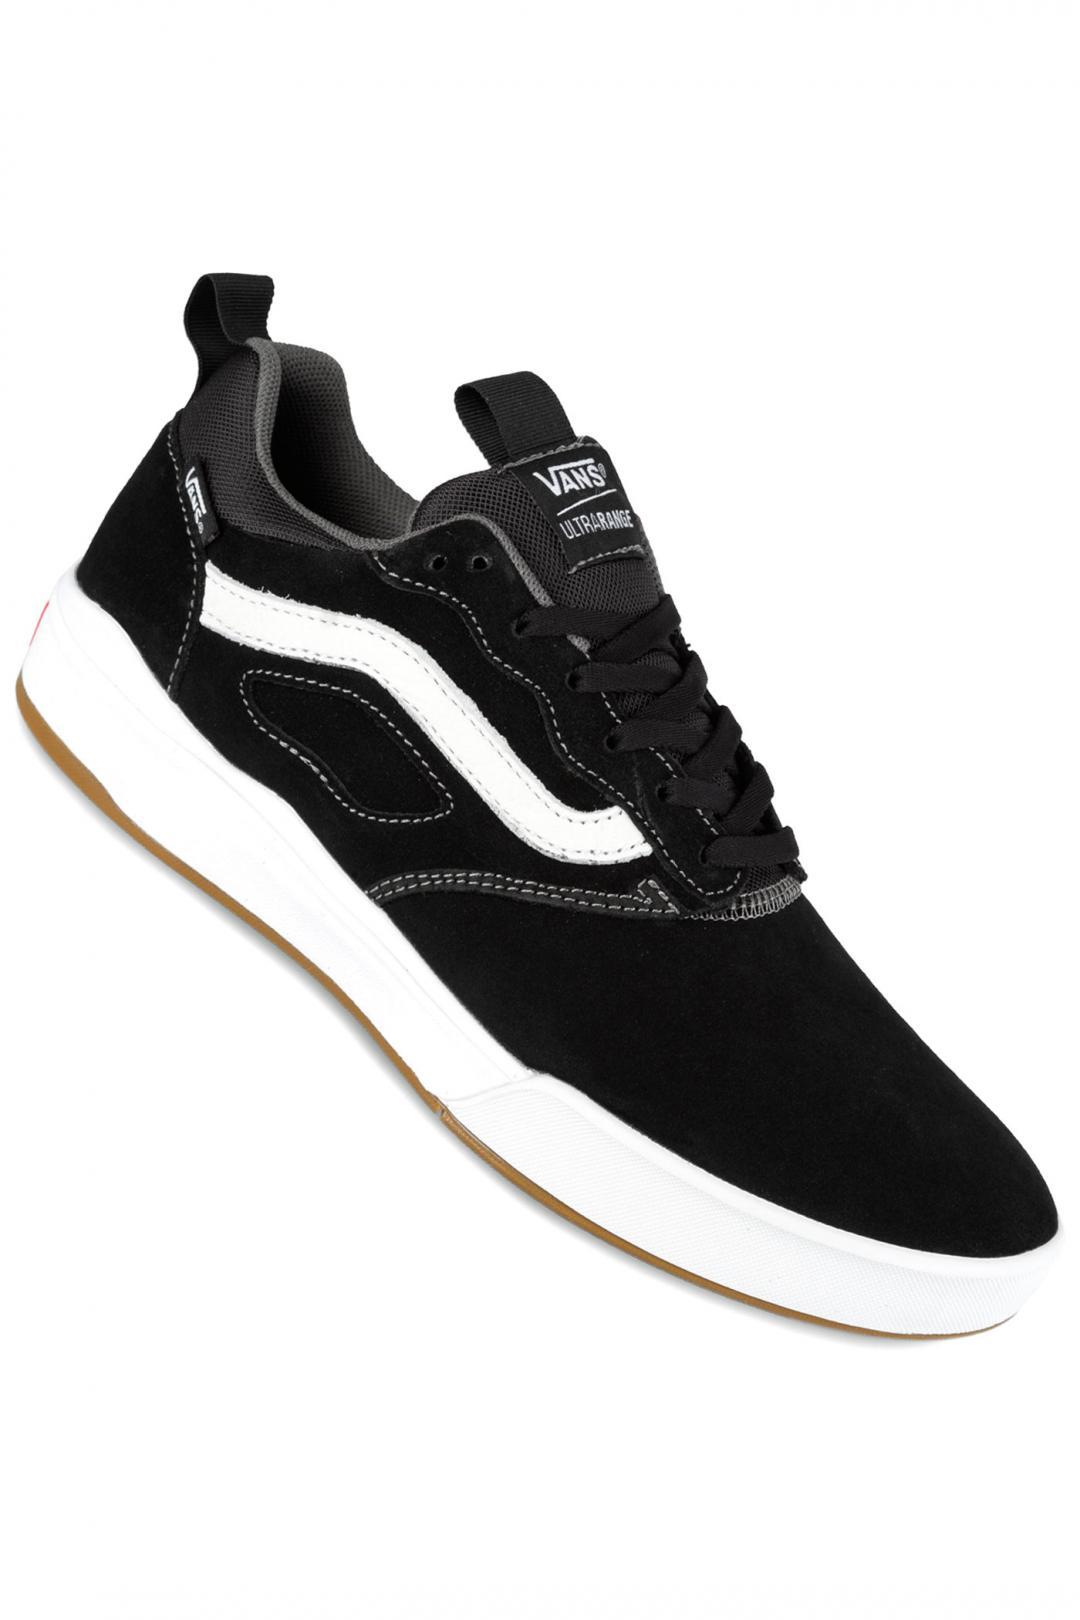 Uomo Vans UltraRange Pro black white   Sneaker